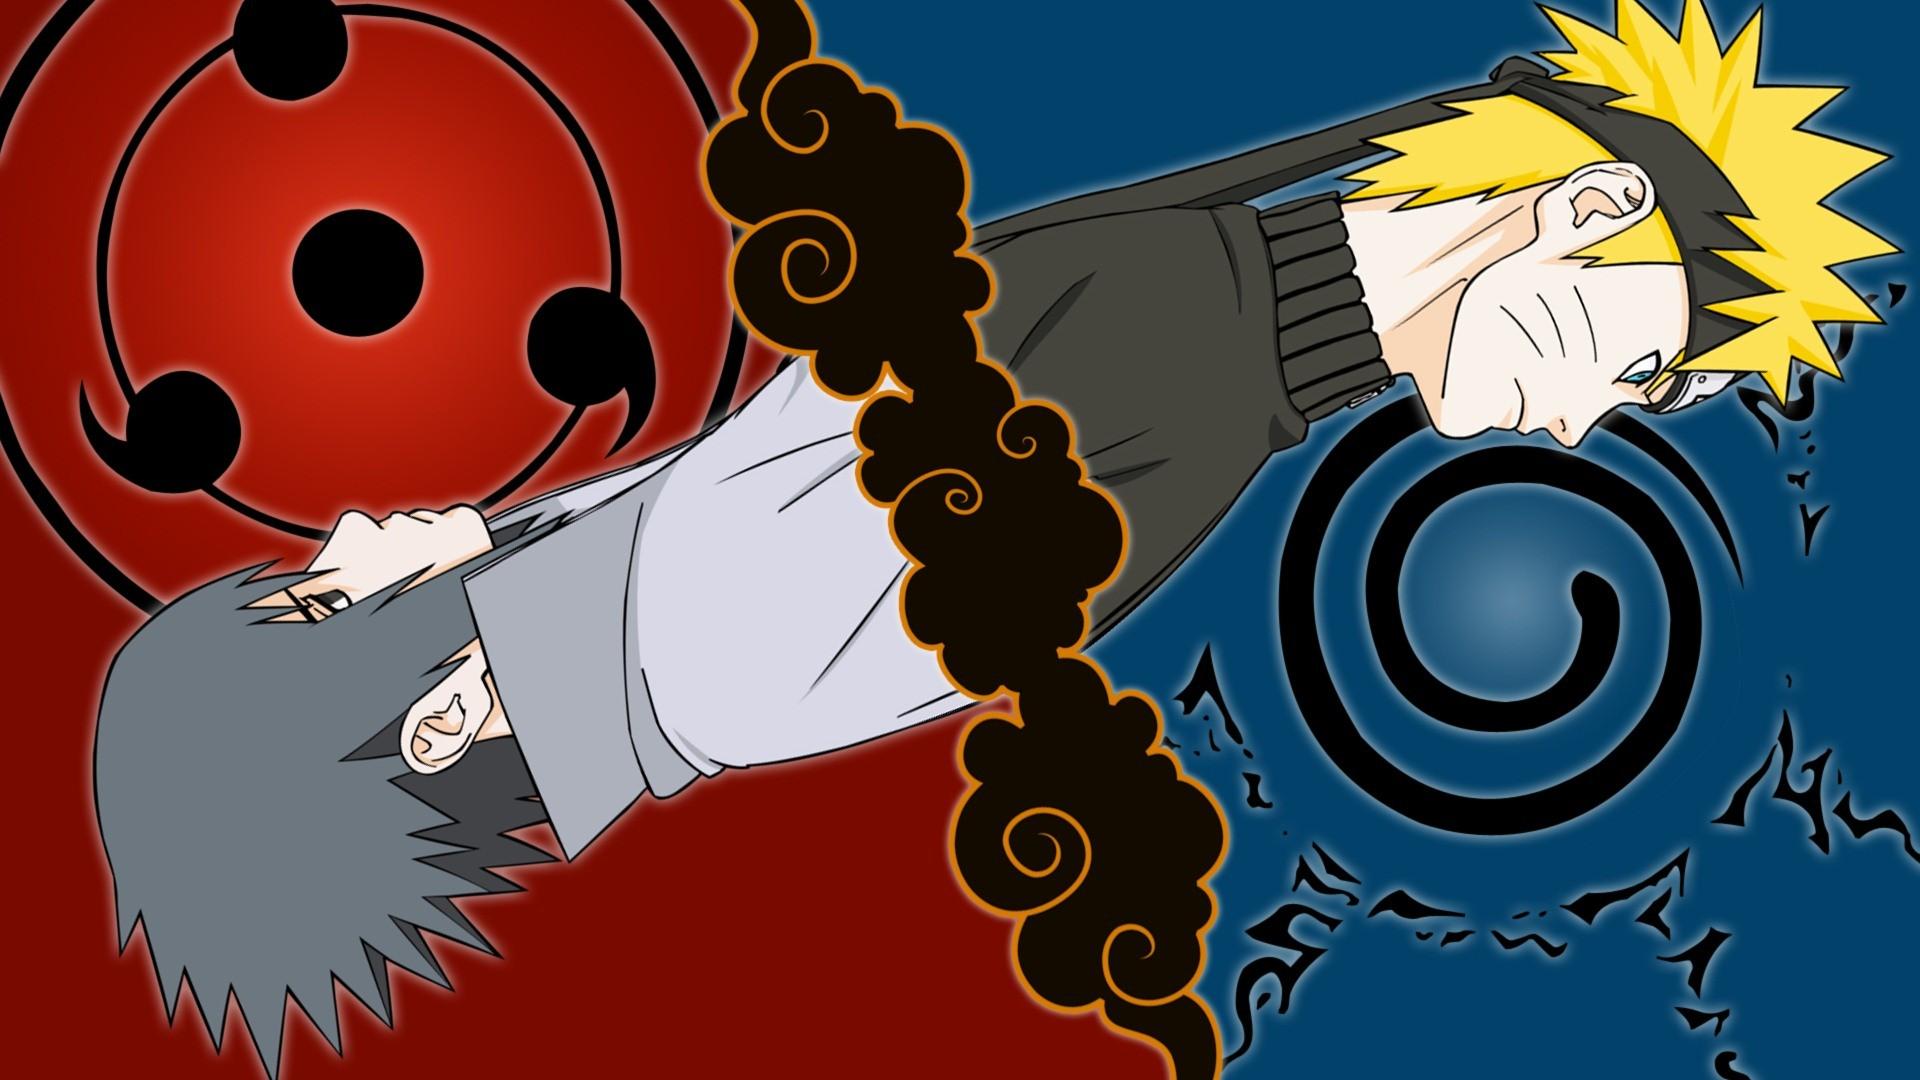 Simple Wallpaper Naruto Desktop - 149700-naruto-wallpaper-1920x1080-1920x1080-picture  Perfect Image Reference_78268.jpg